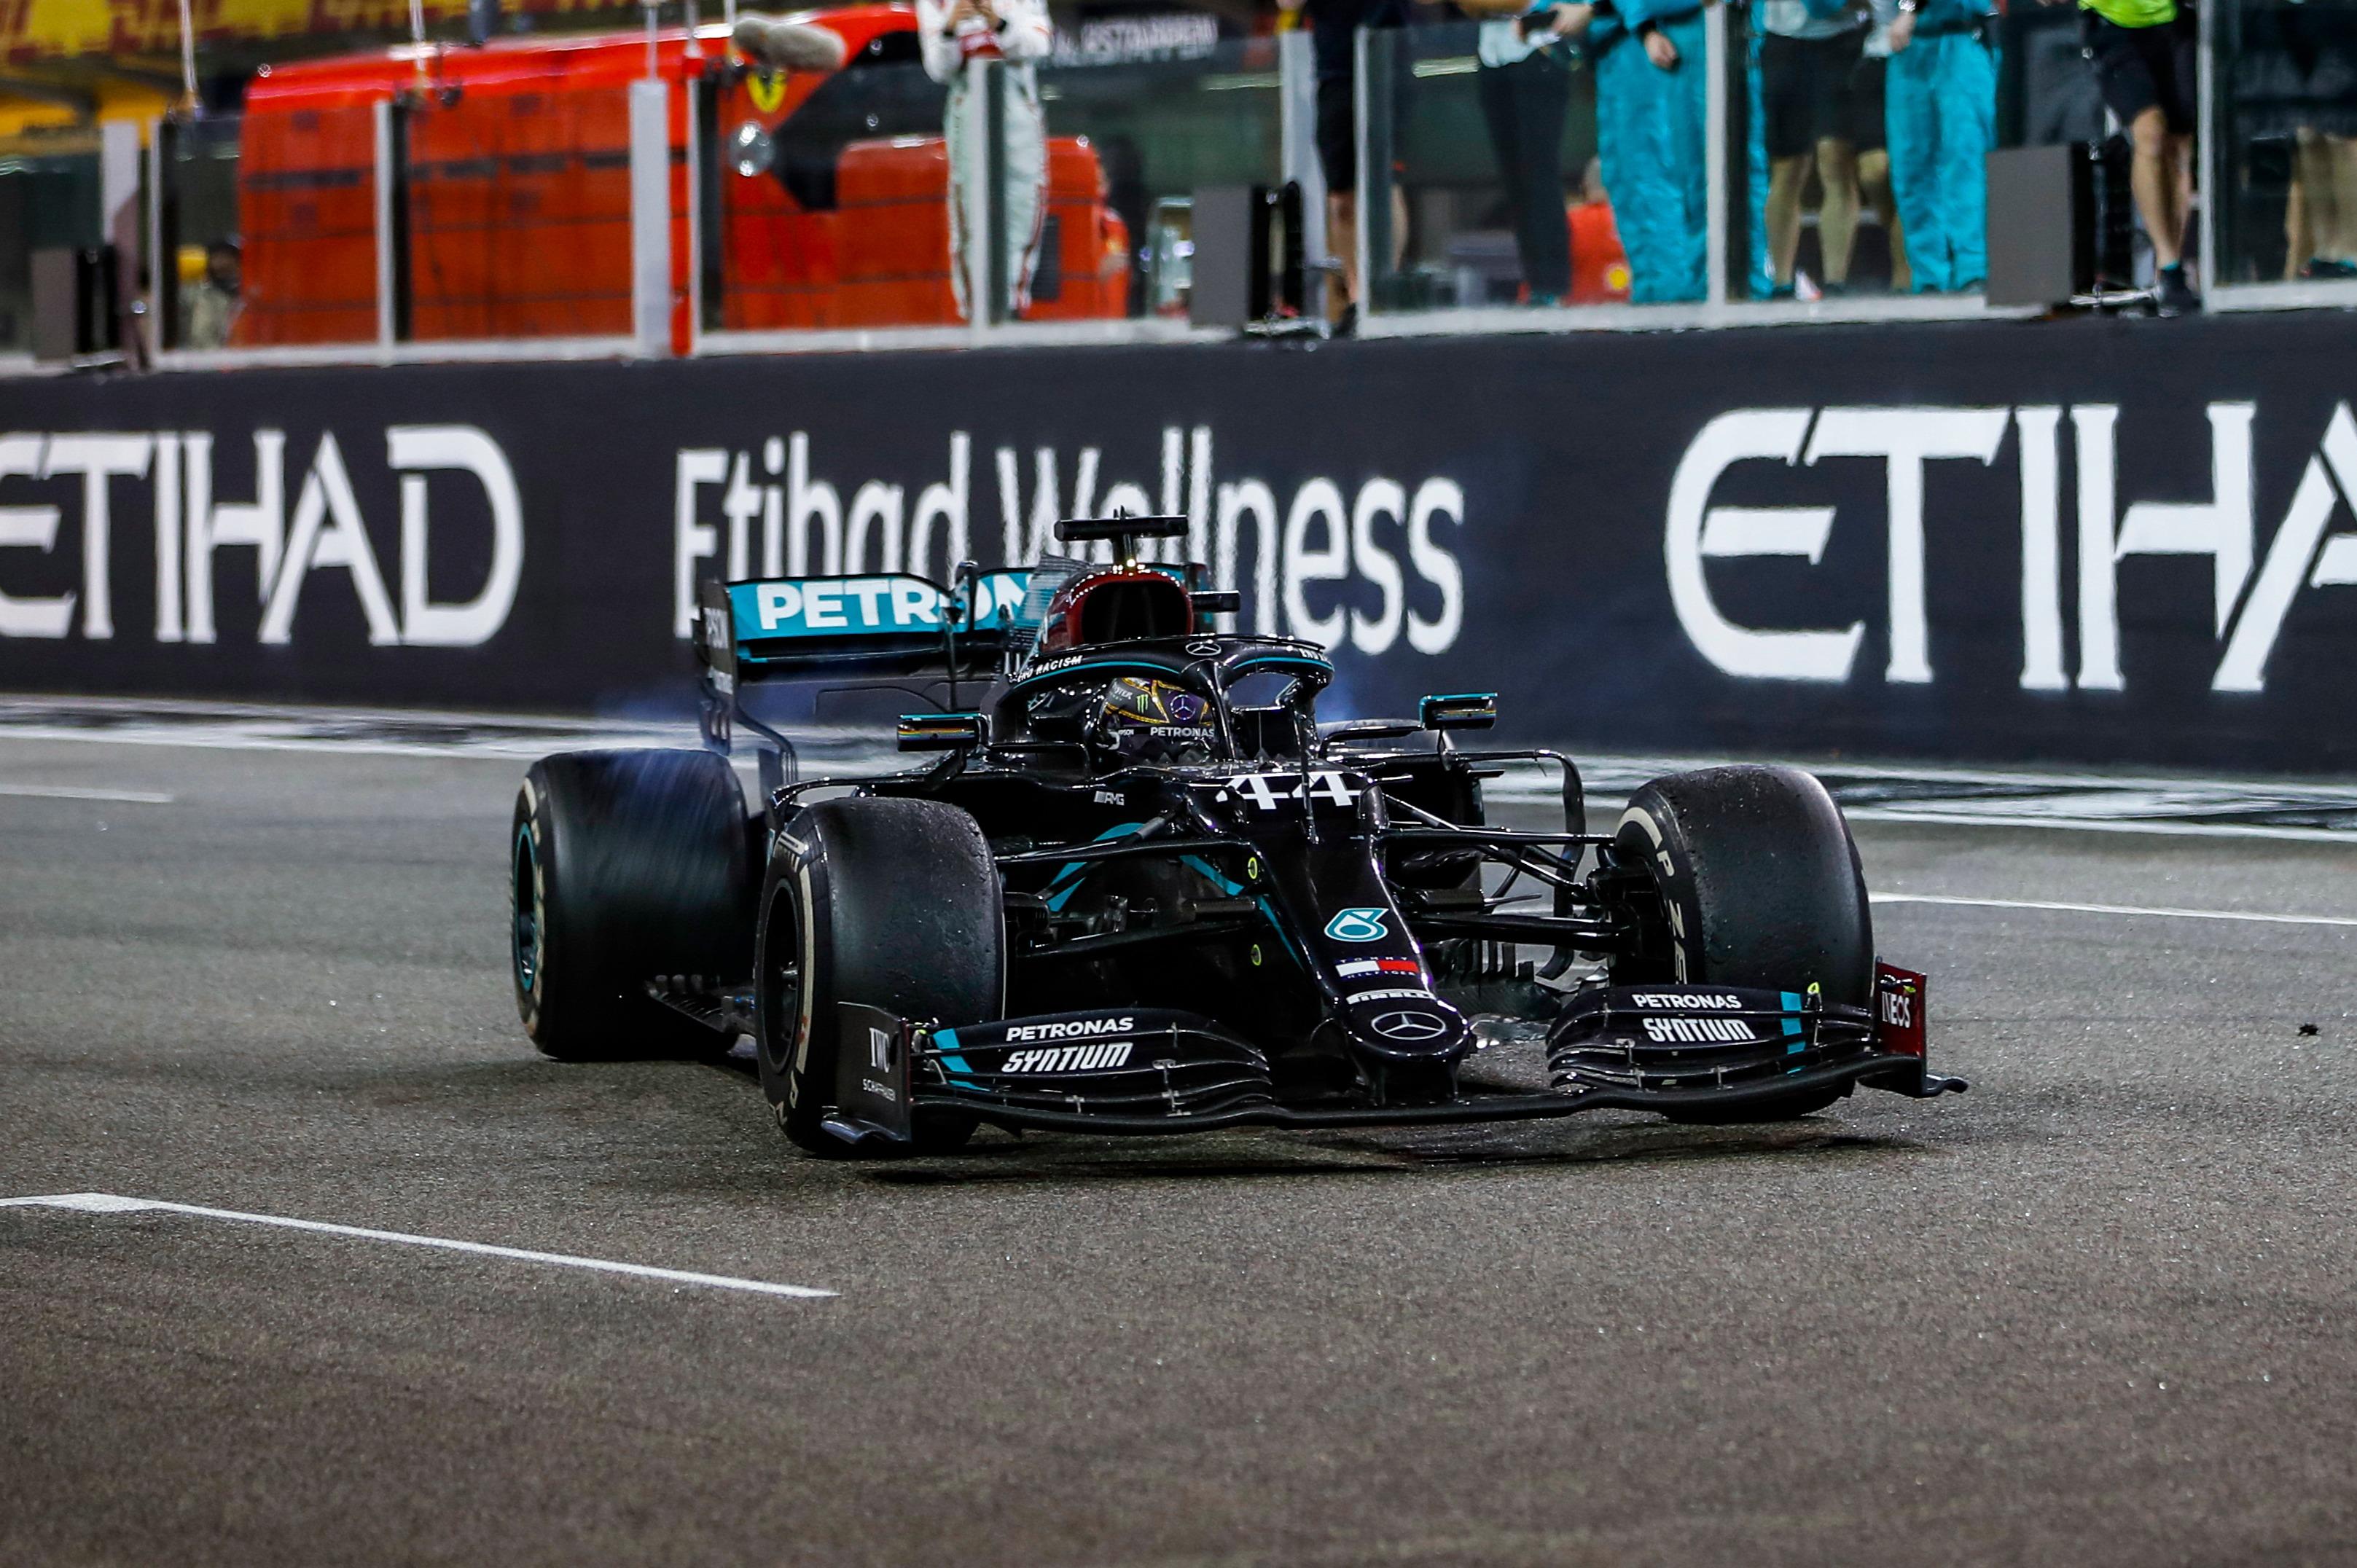 Lewis Hamilton, F1 Abu Dhabi Grand Prix 2020